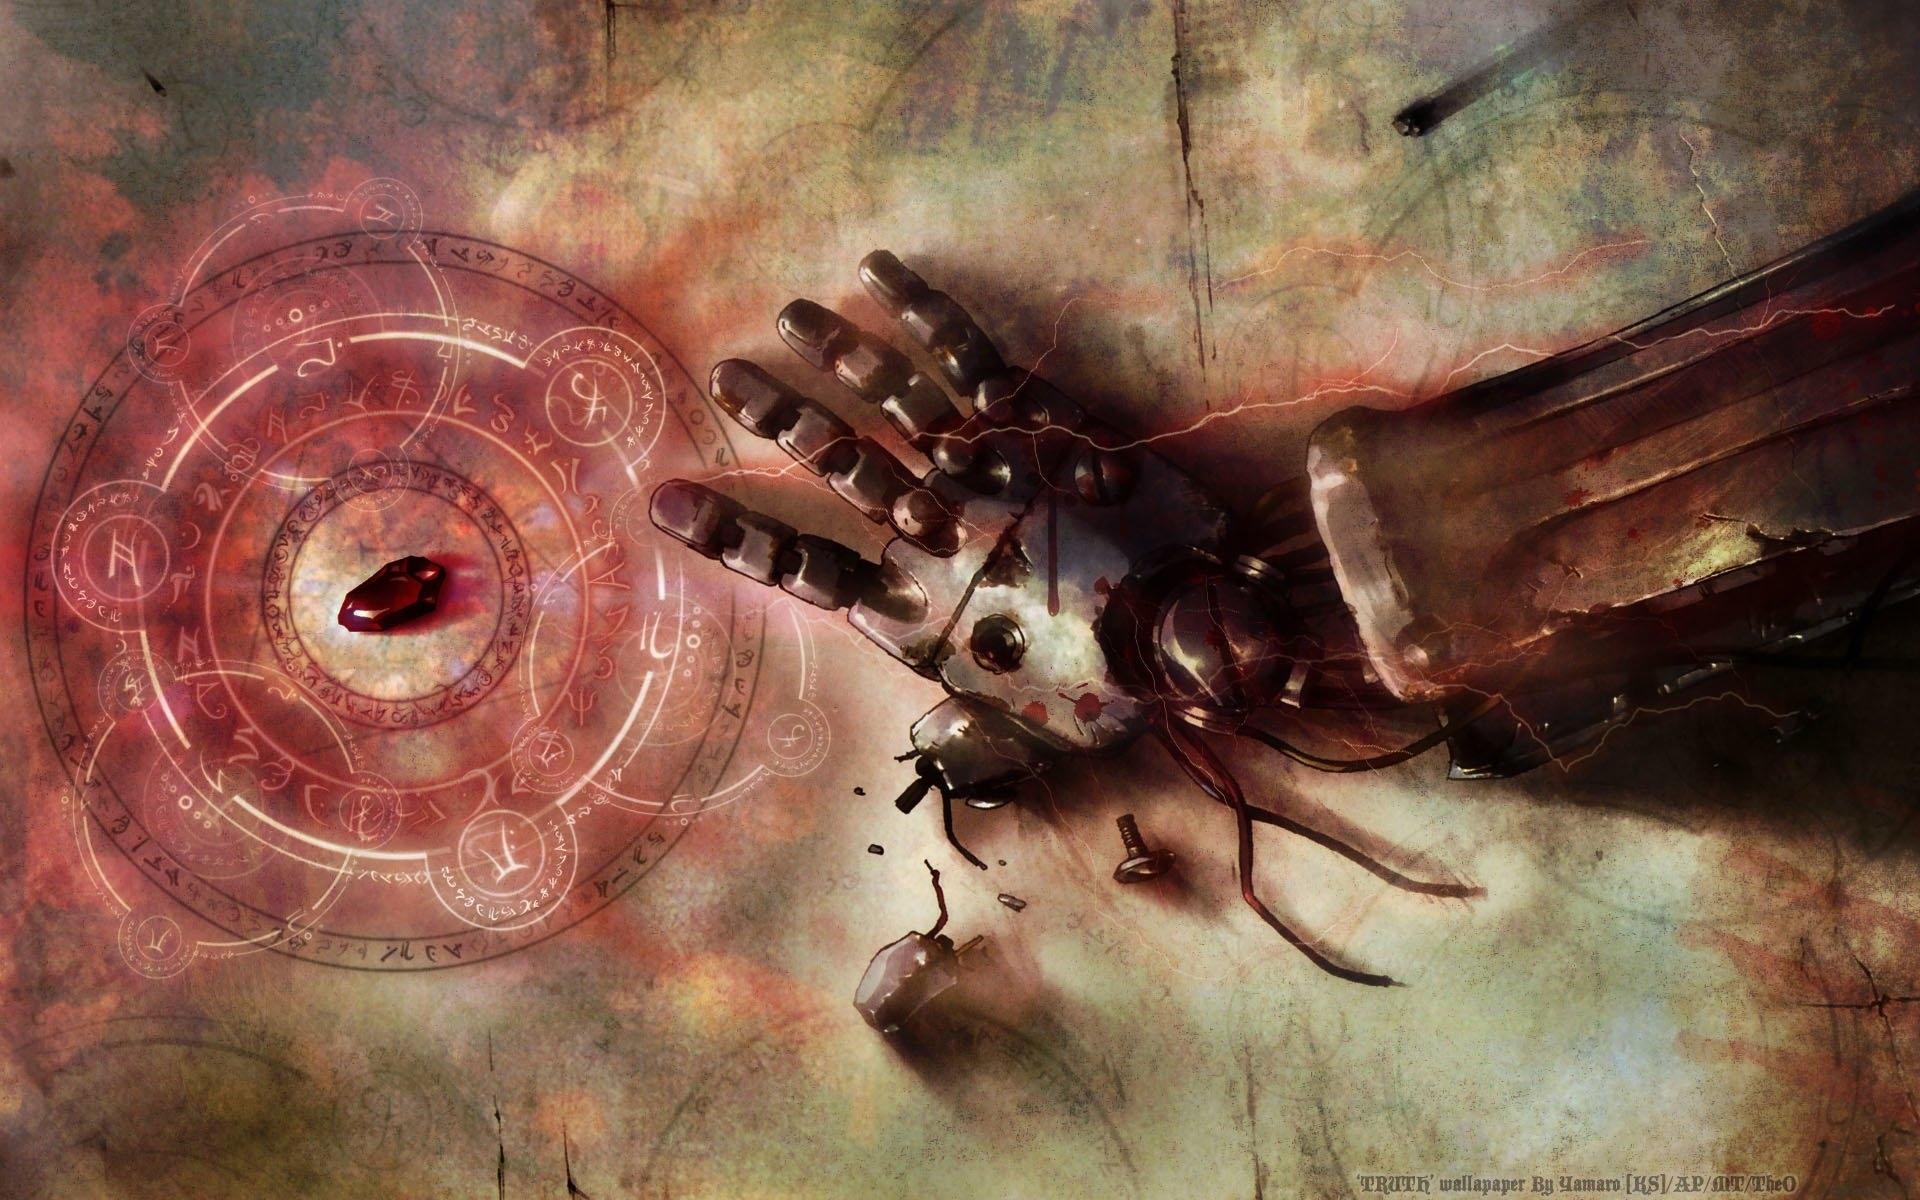 747 fullmetal alchemist hd wallpapers | background images